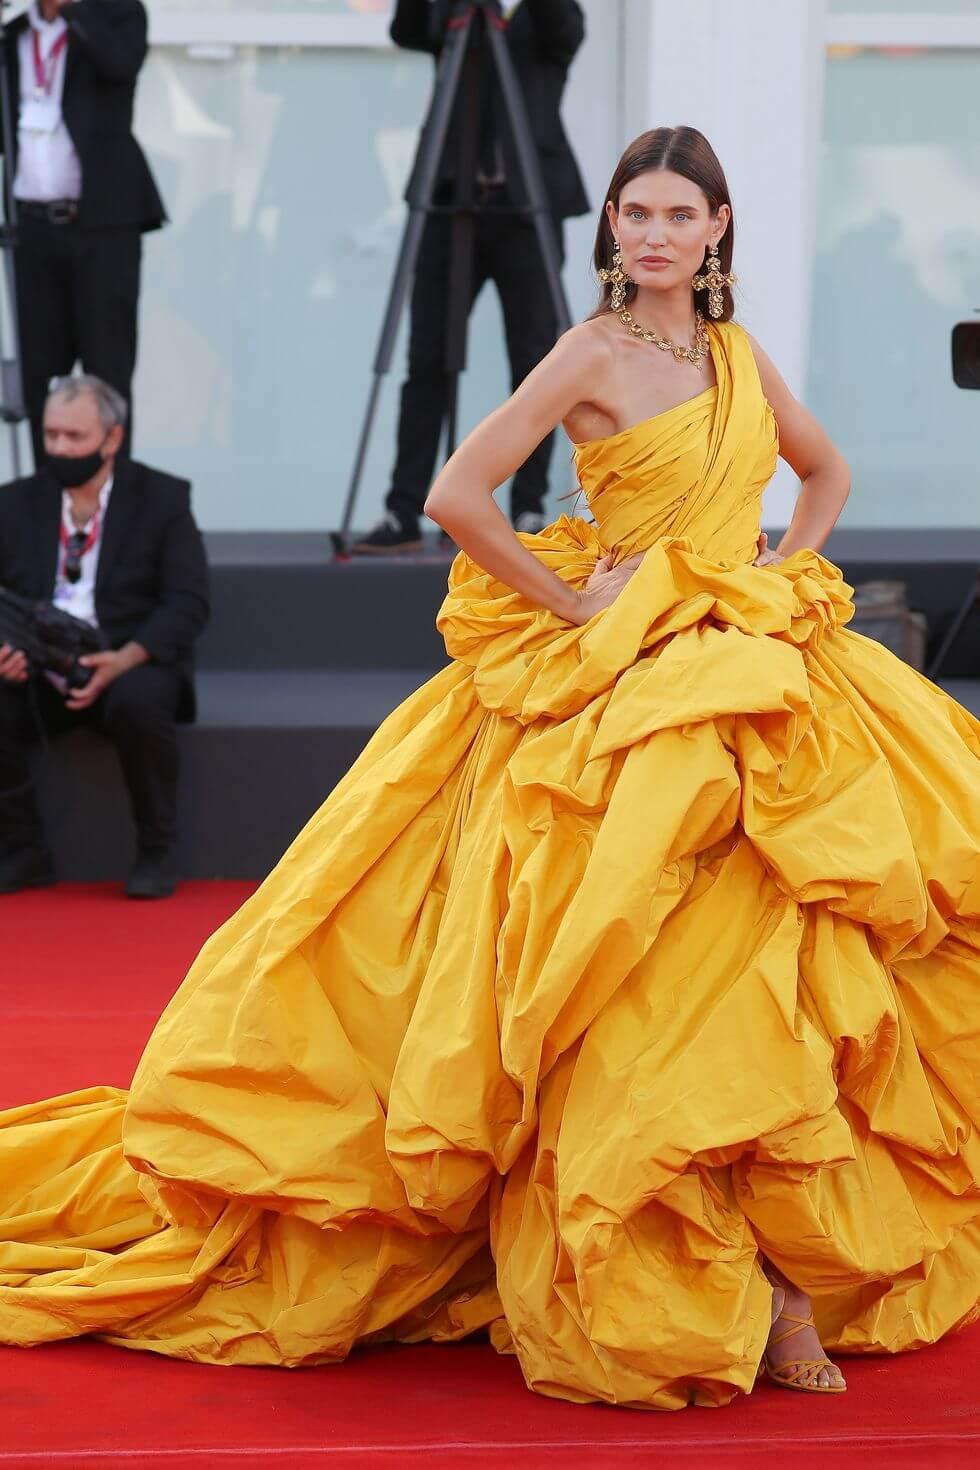 festival cinema venezia 2021 Red Carpet prima serata Life&People Magazine LifeandPeople.it